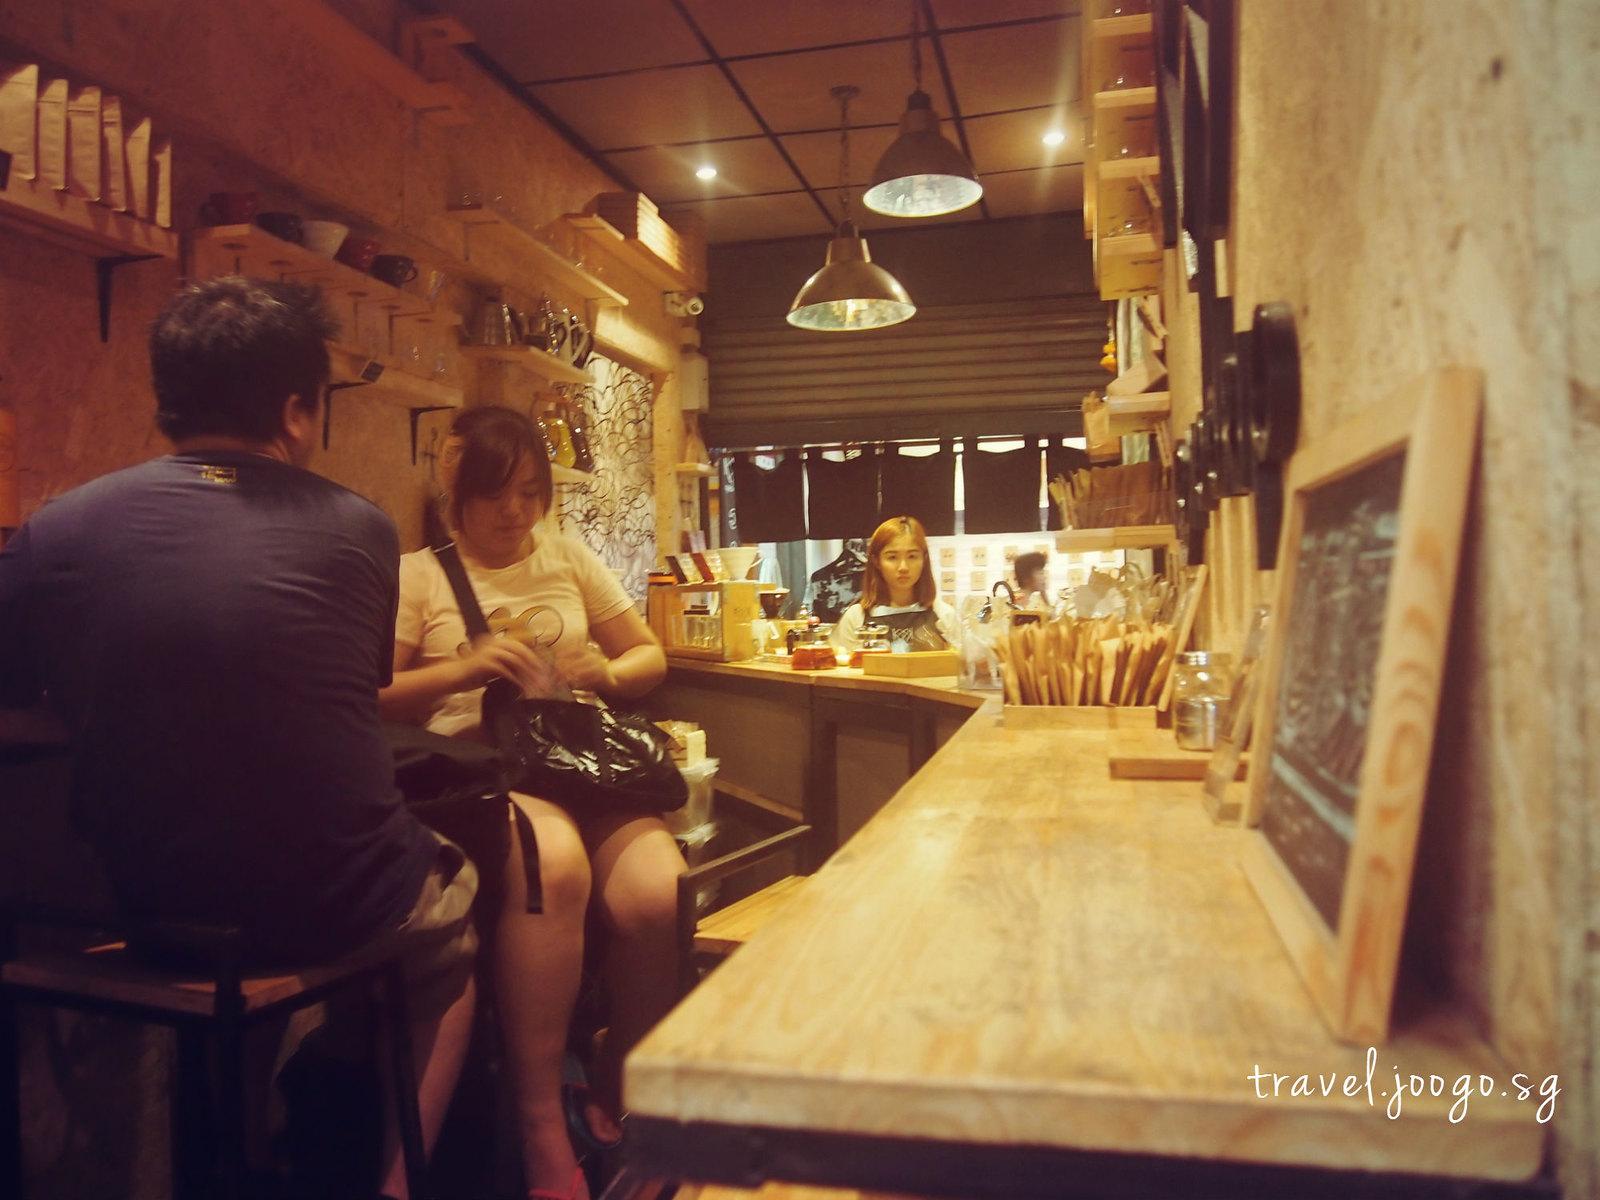 chatuchak coffee -travel.joogostyle.com